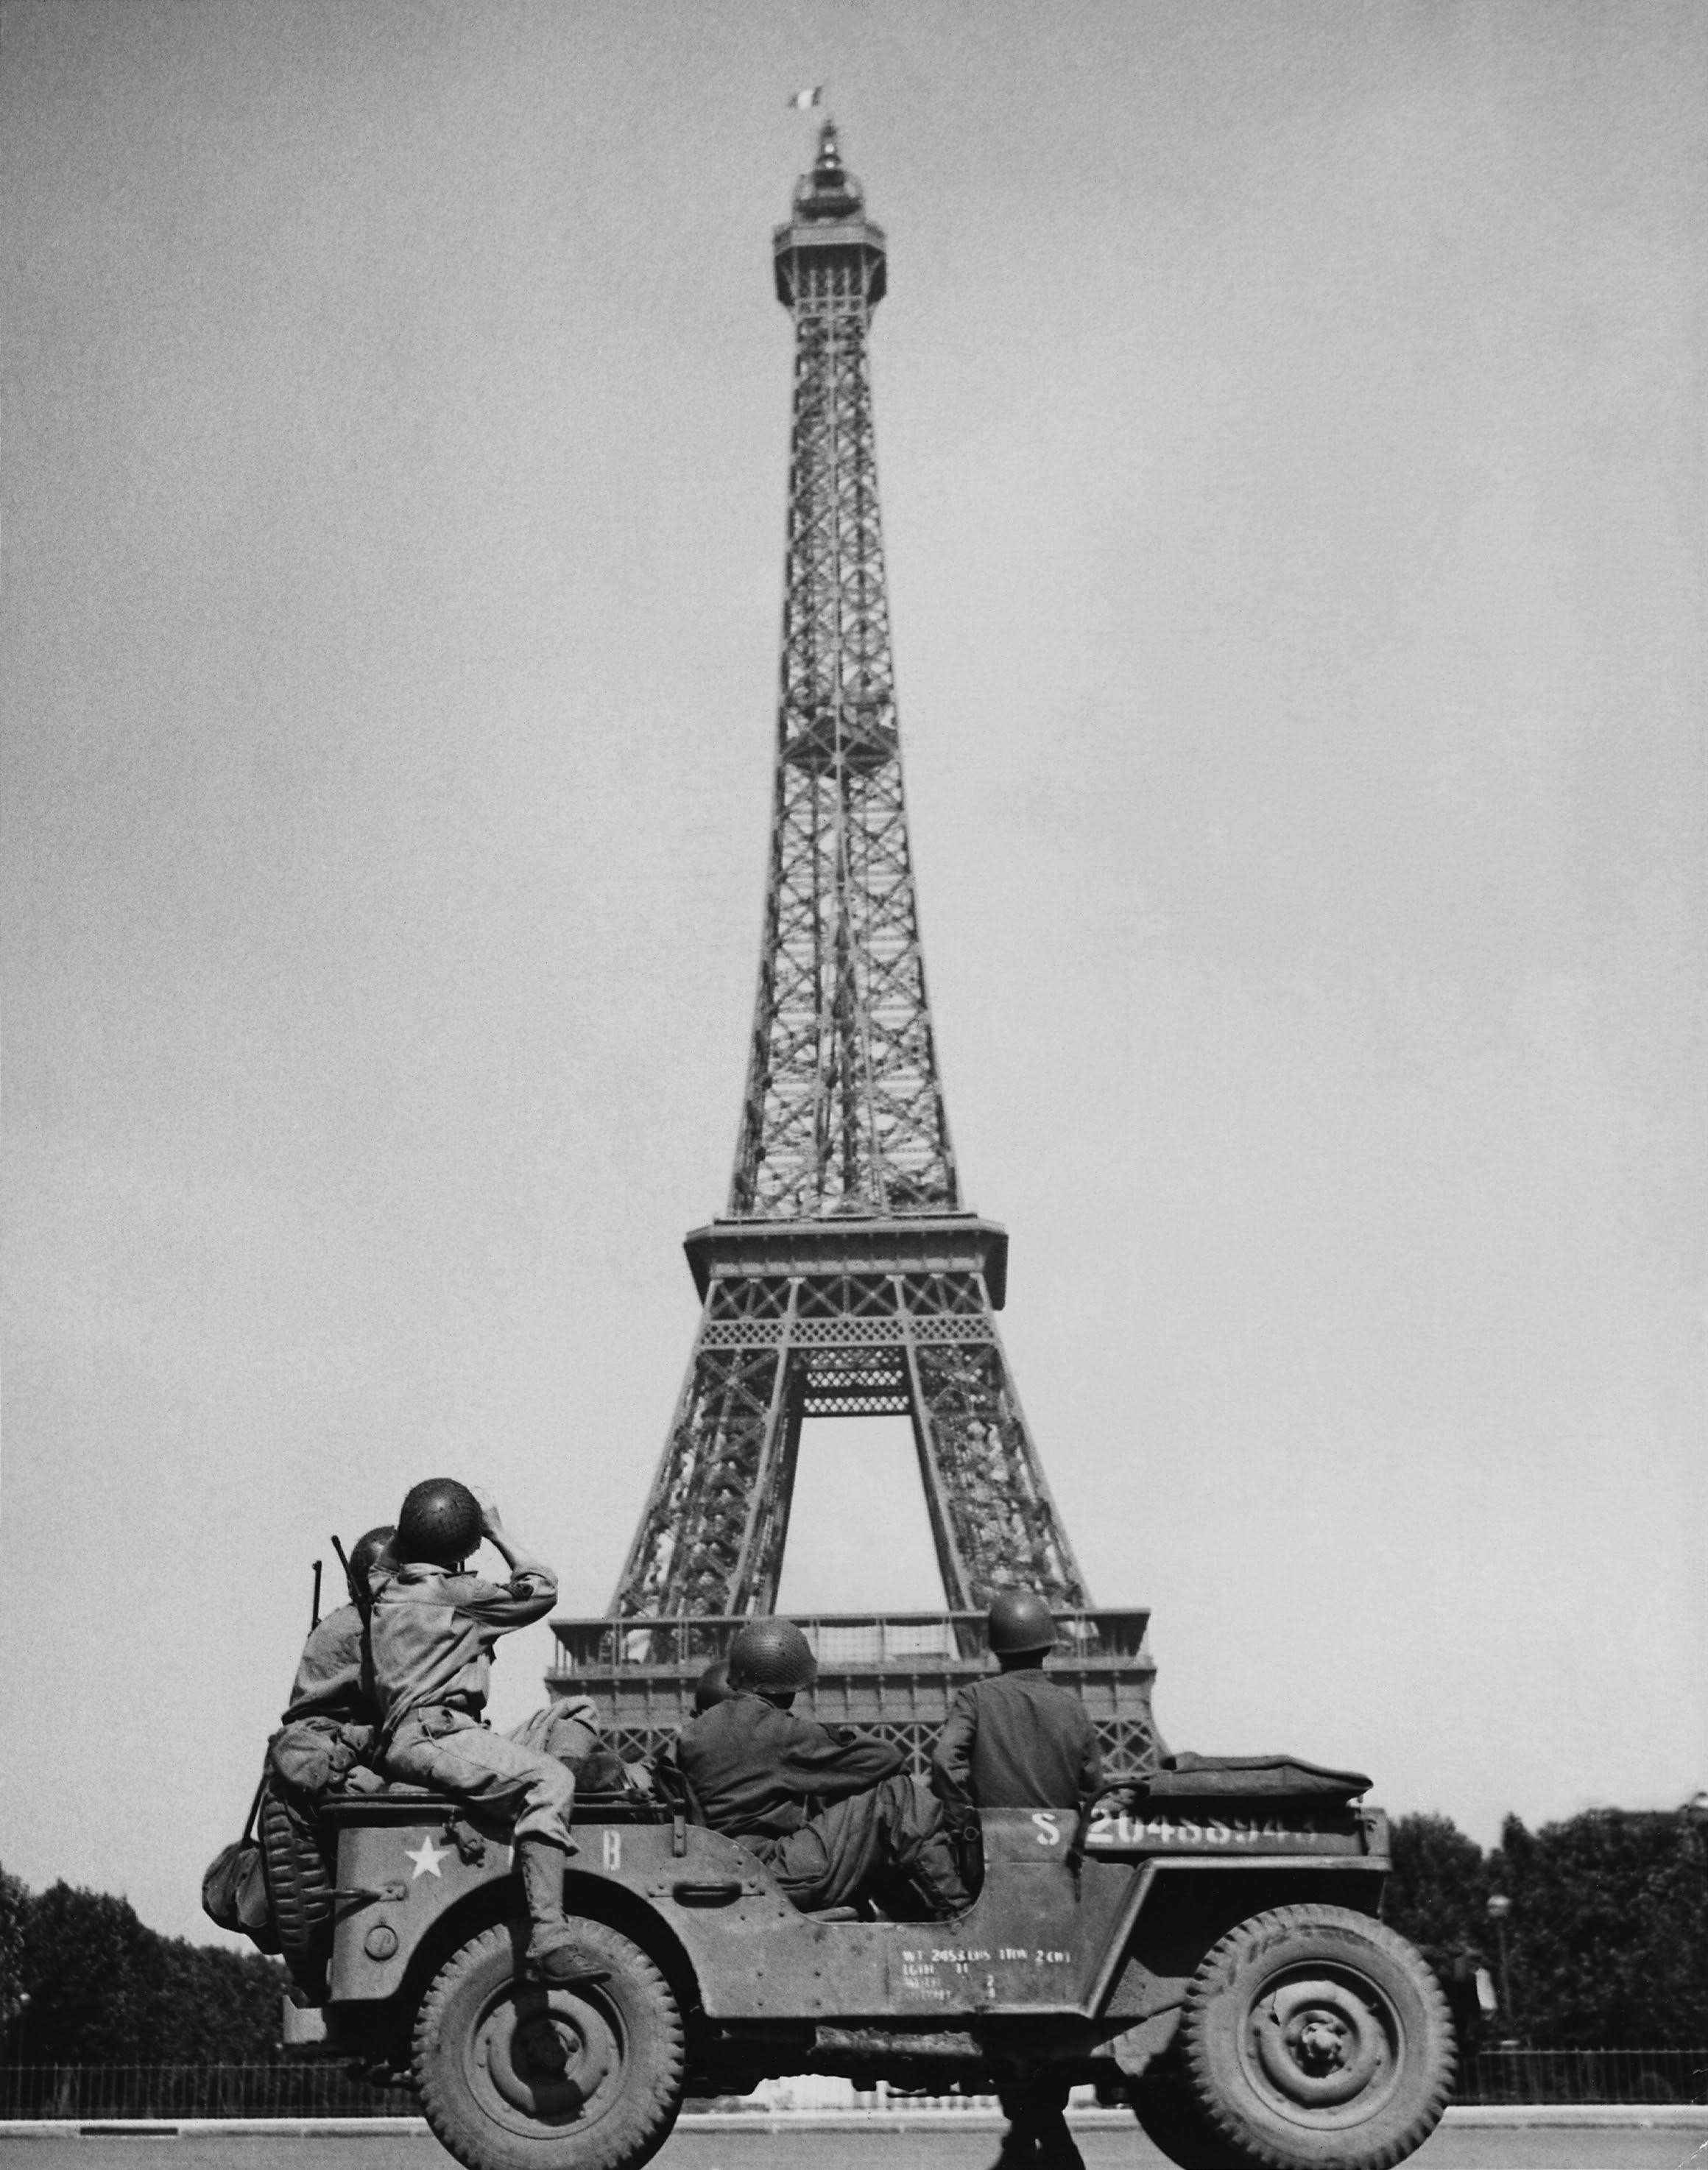 Eiffel Tower - Wikipedia, the free encyclopedia